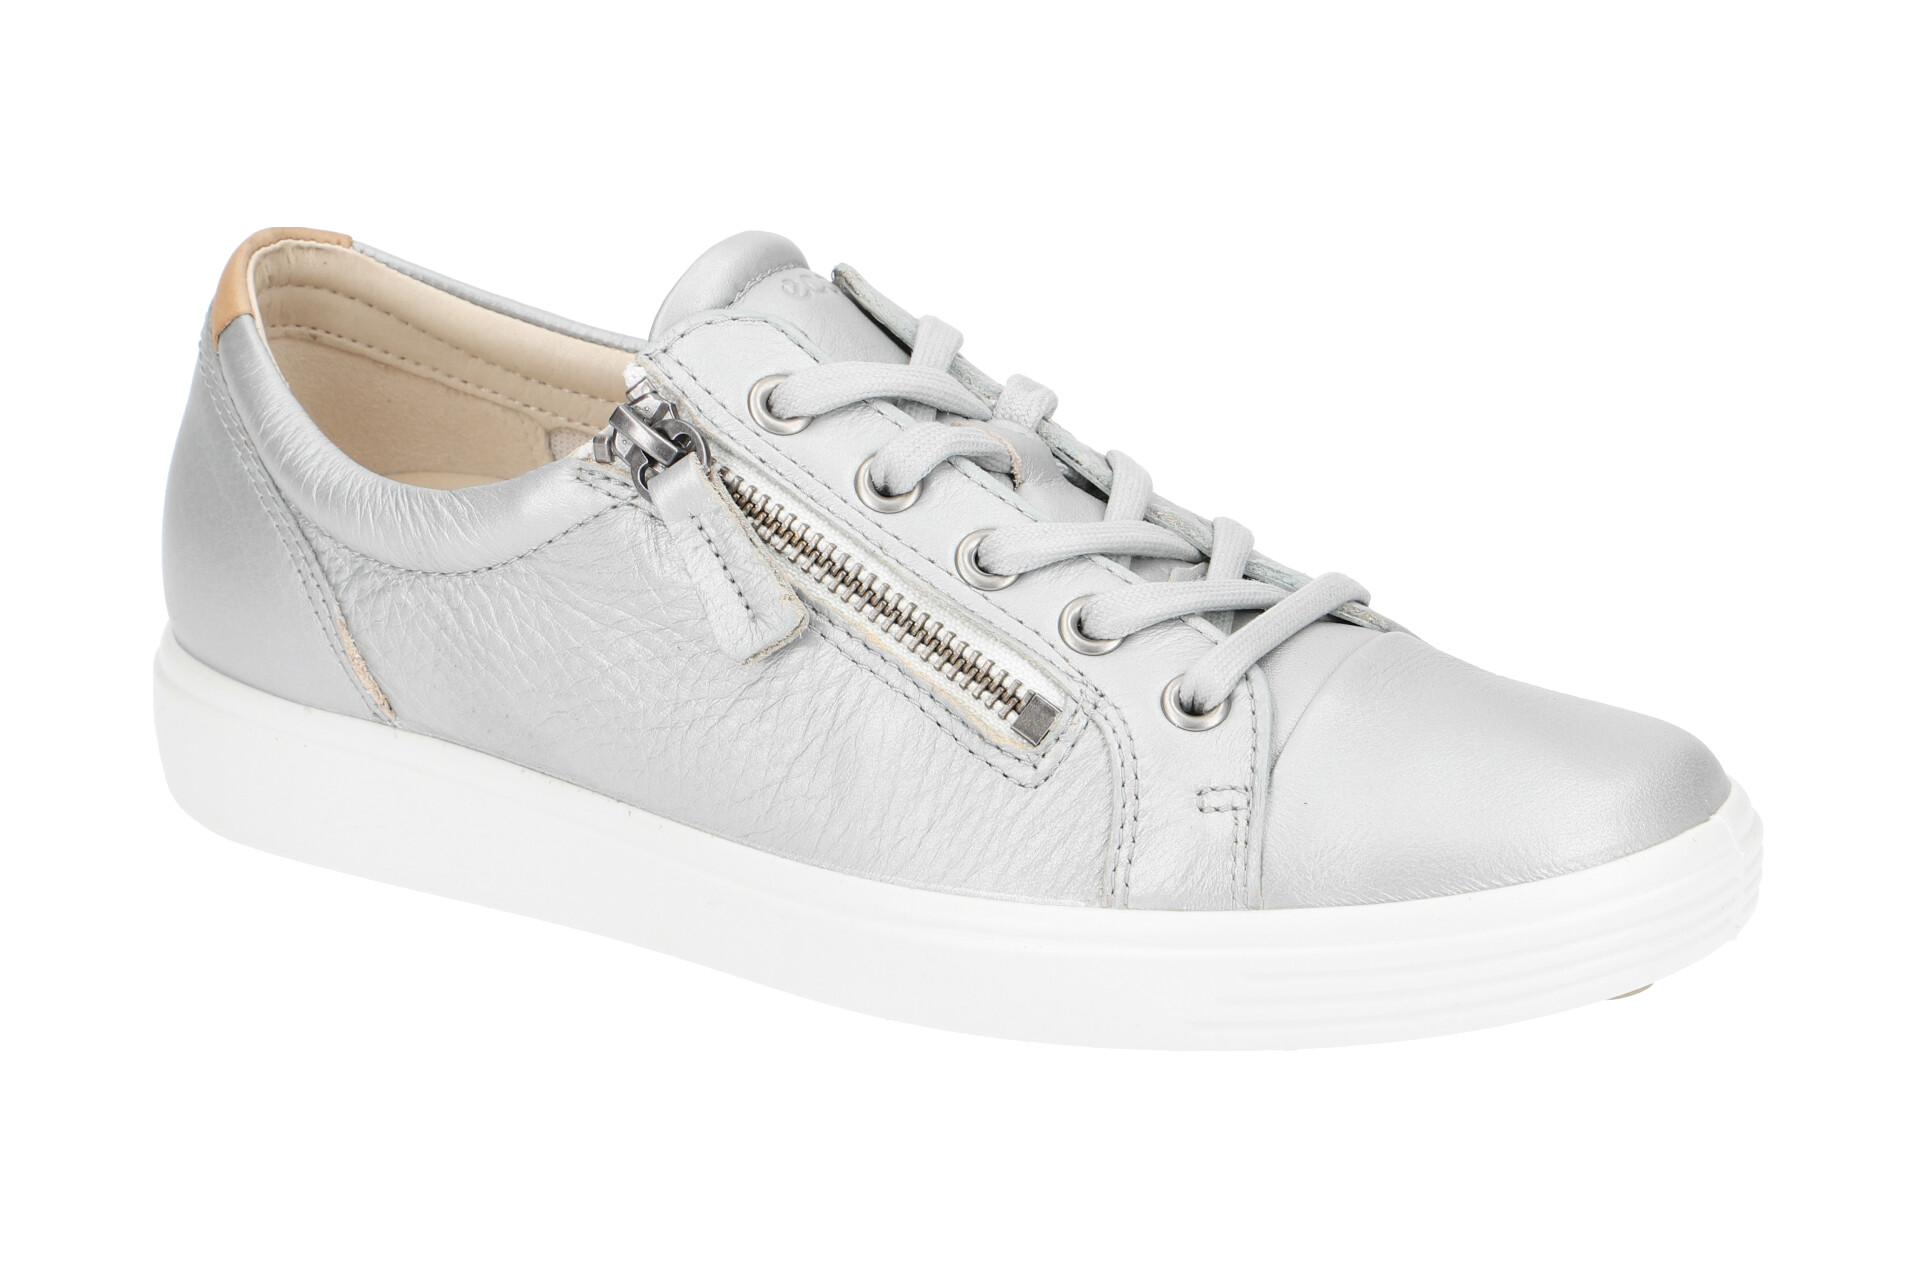 Ecco Soft 7 Damen Schuhe grau metallic